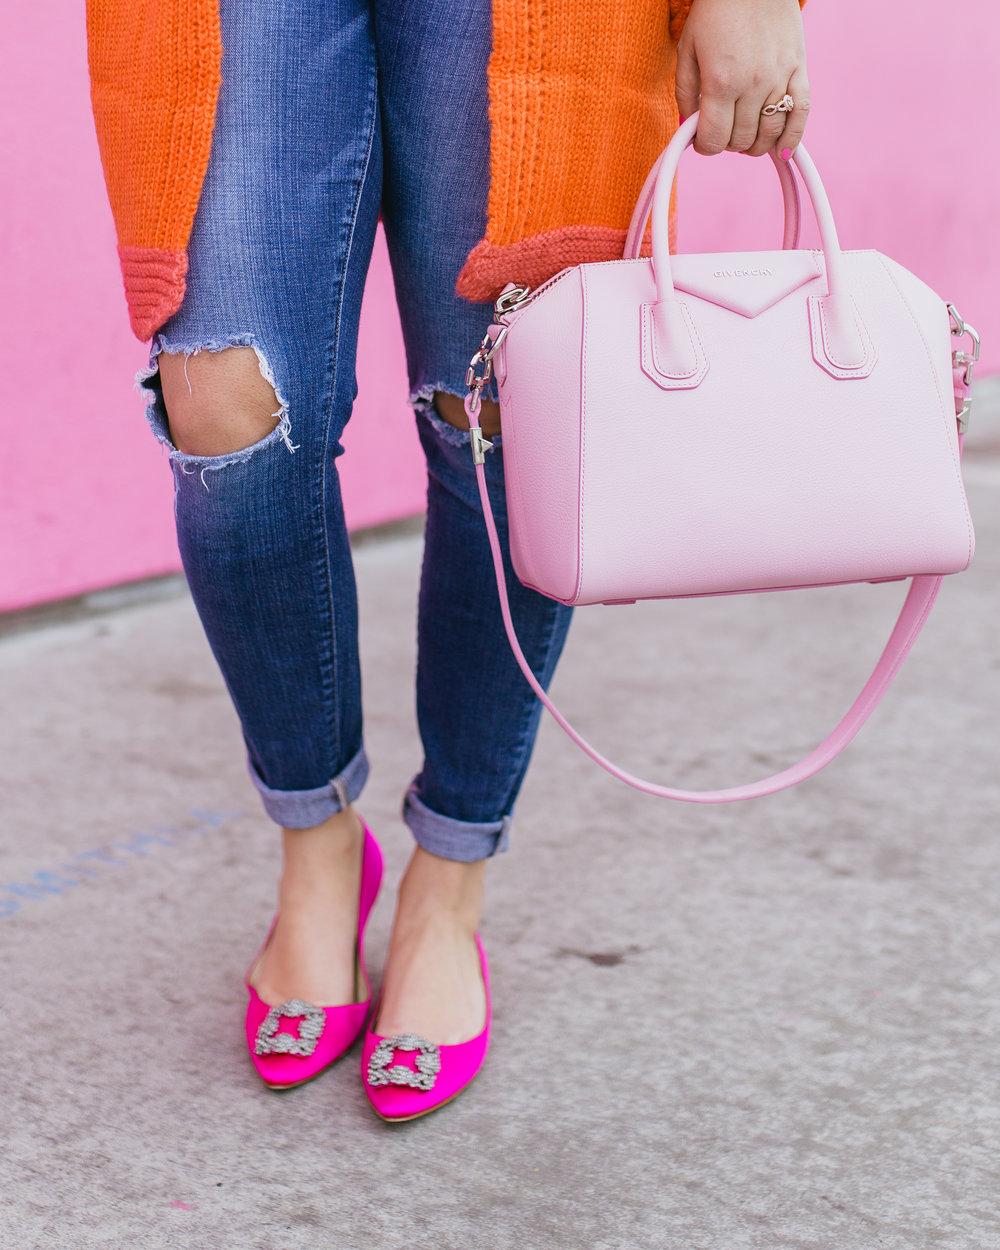 los angeles fashion blogger photographer